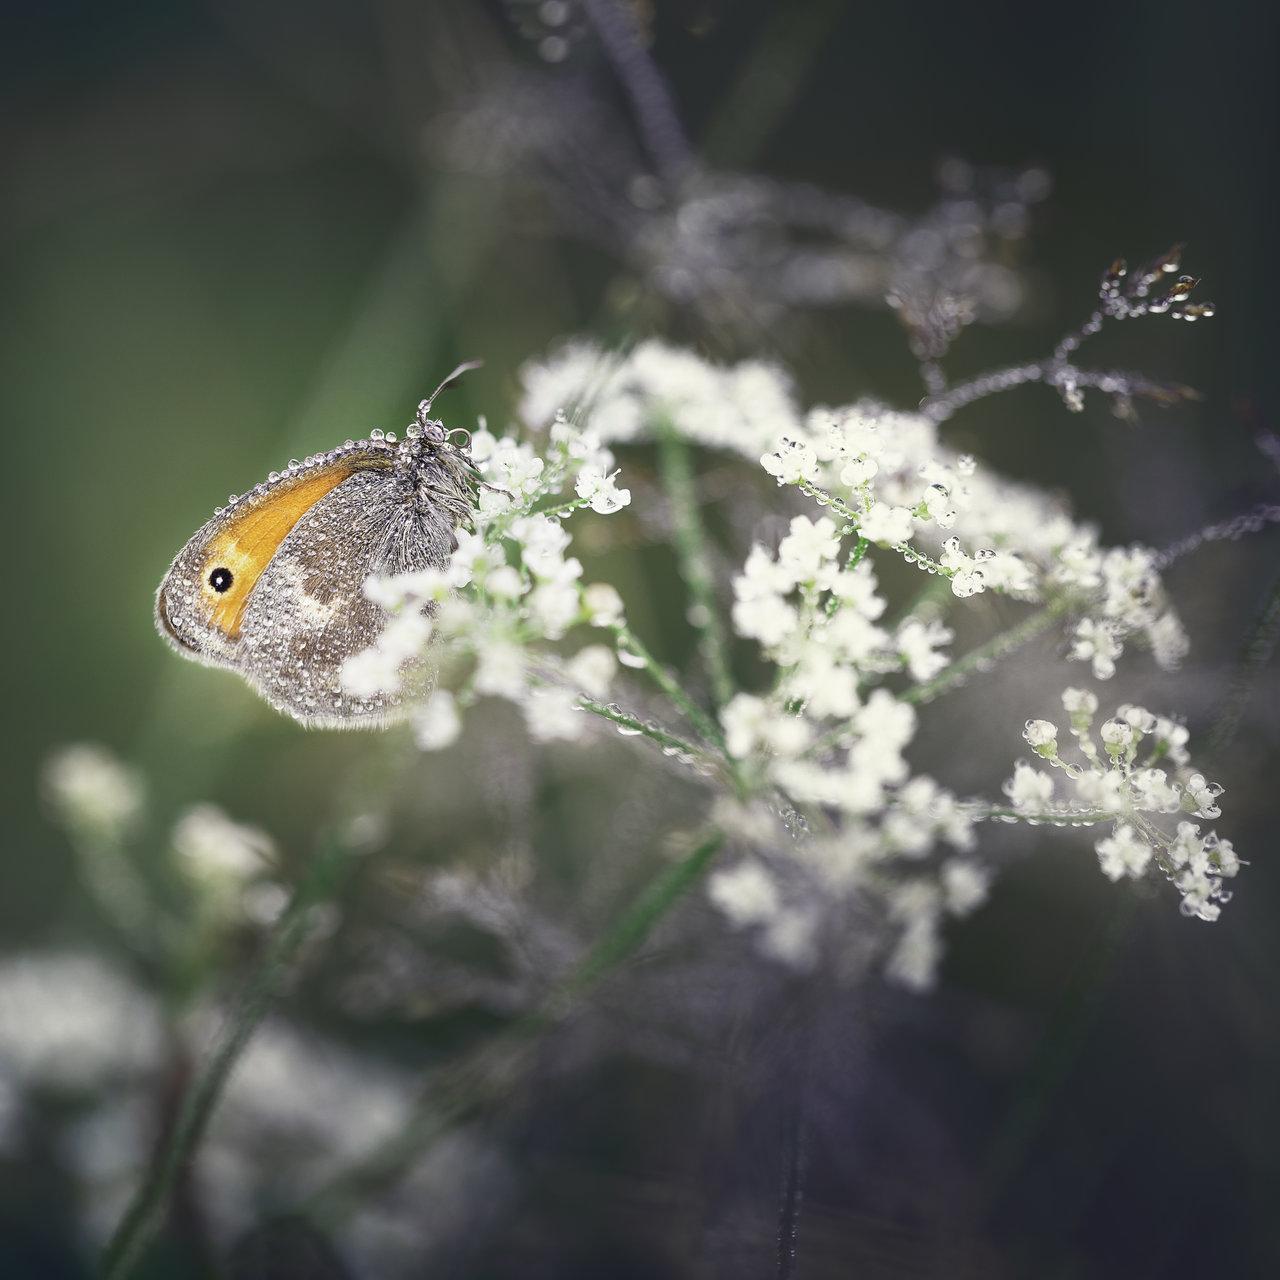 Photo in Macro | Author valniuk | PHOTO FORUM